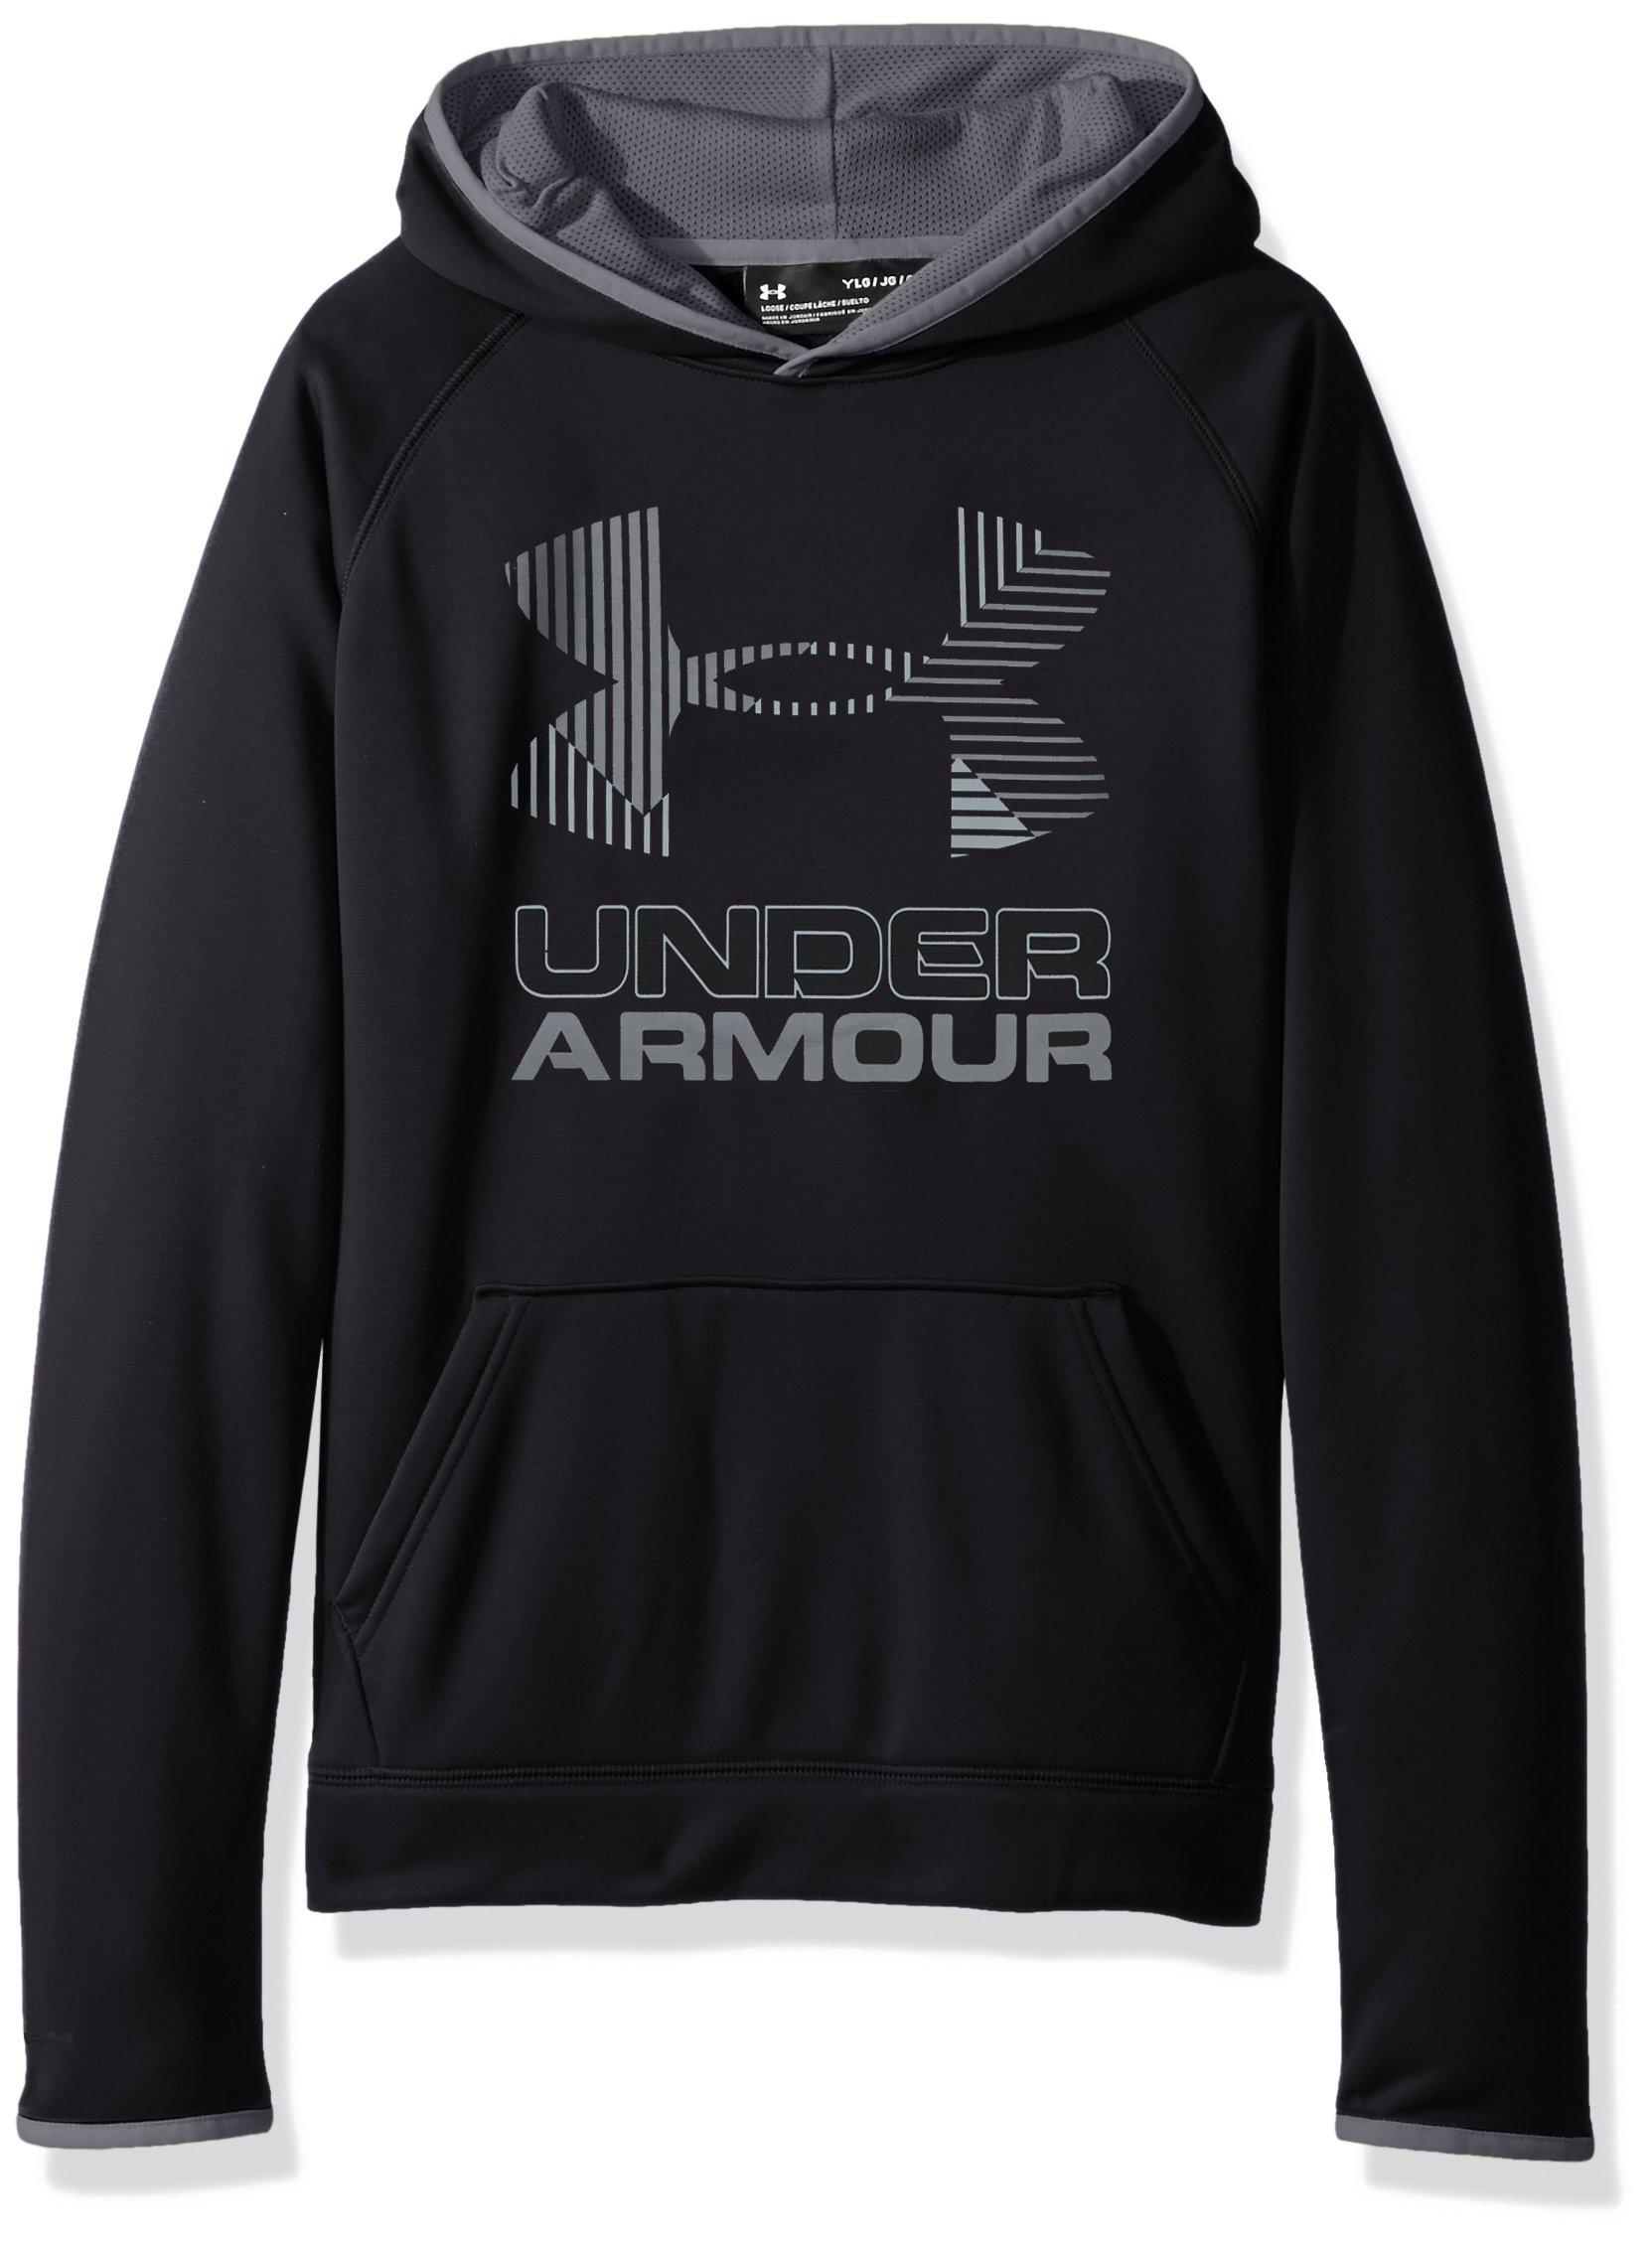 Under Armour Boys' Armour Fleece Solid Big Logo Hoodie, Black /Steel, Youth X-Small